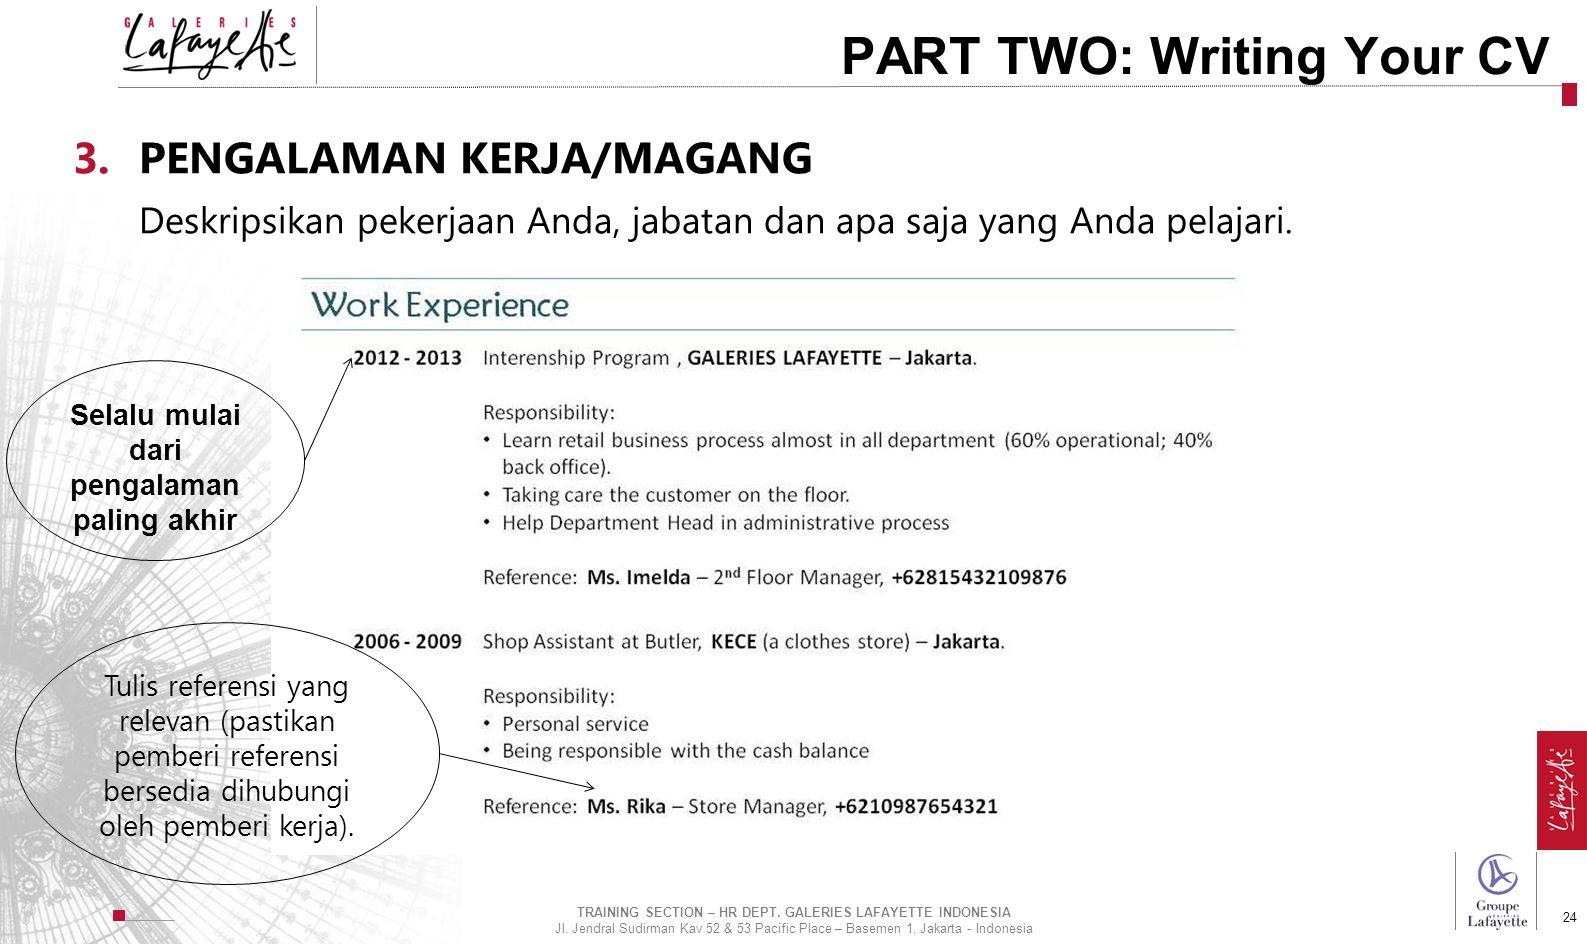 Direction de l'International 24 PART TWO: Writing Your CV 3.PENGALAMAN KERJA/MAGANG Deskripsikan pekerjaan Anda, jabatan dan apa saja yang Anda pelaja